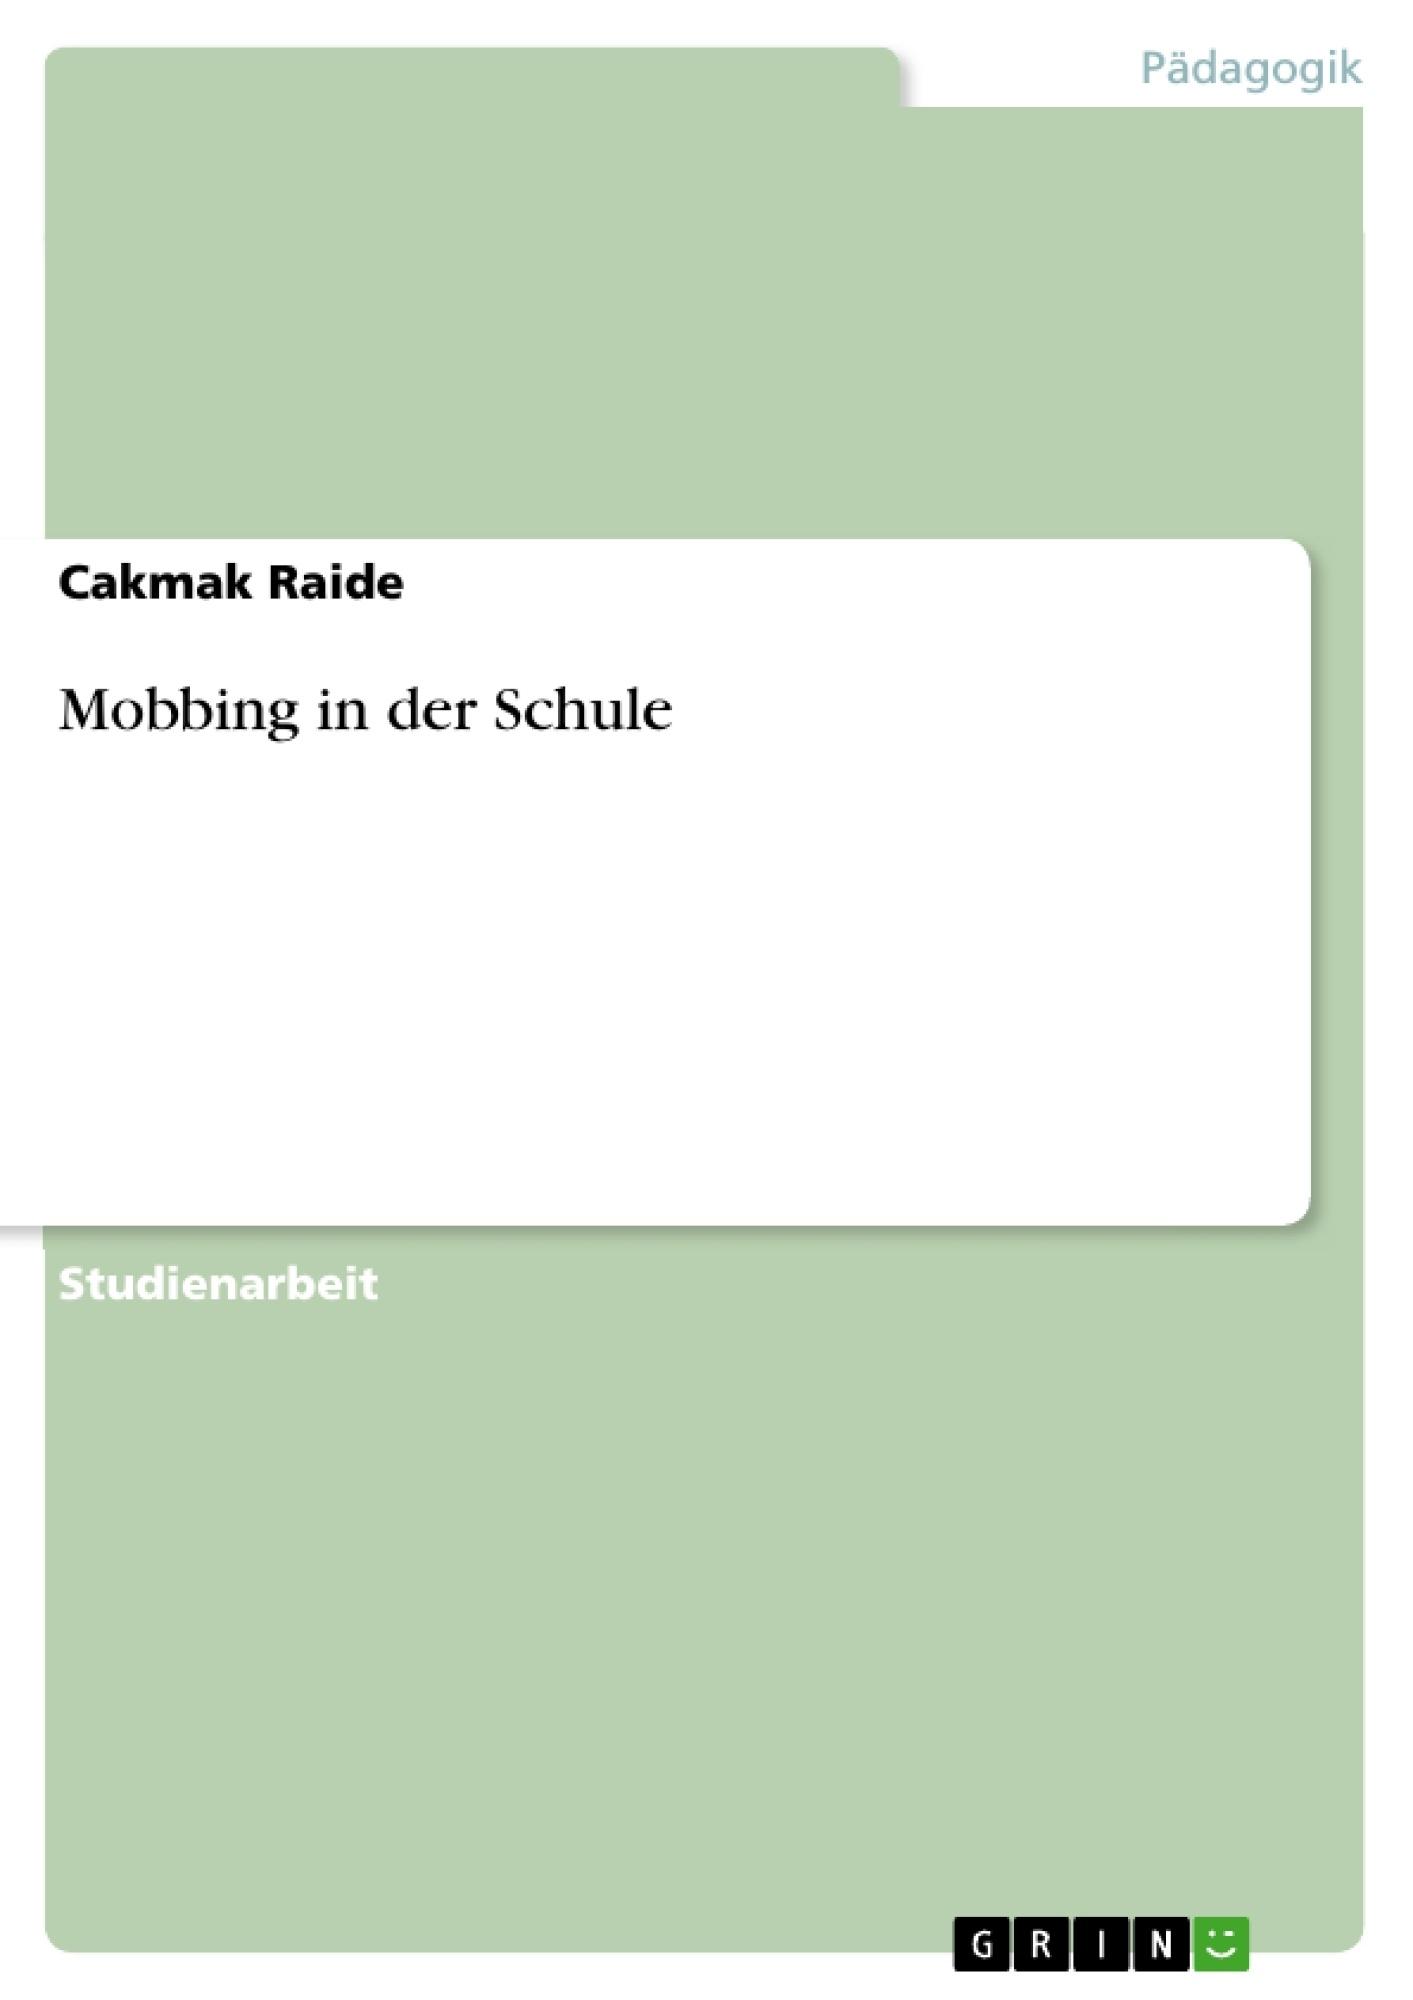 Titel: Mobbing in der Schule